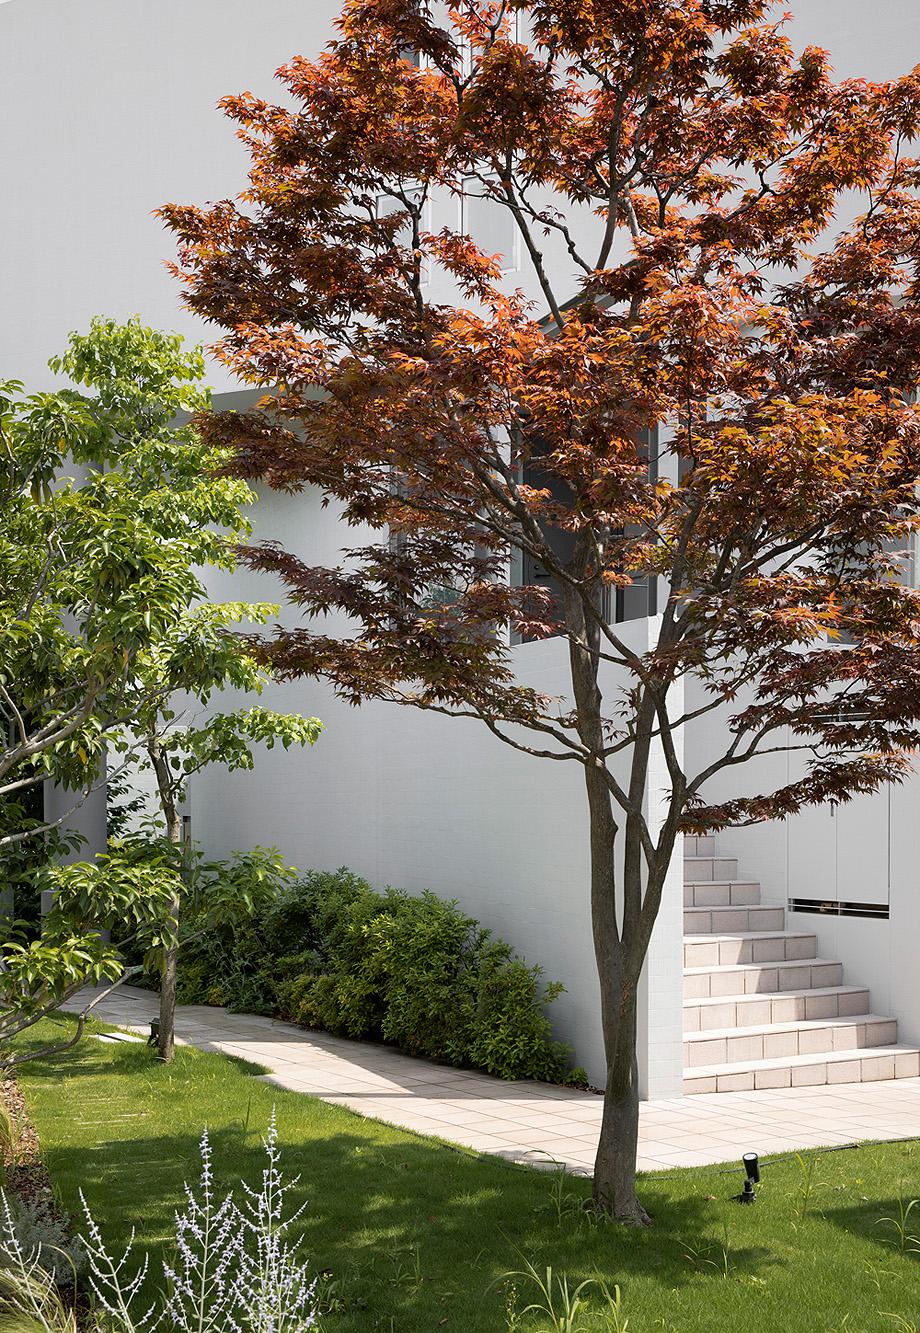 kinuta terrace de keiji ashizawa design y norm architects - foto jonas bjerre-poulsen (18)